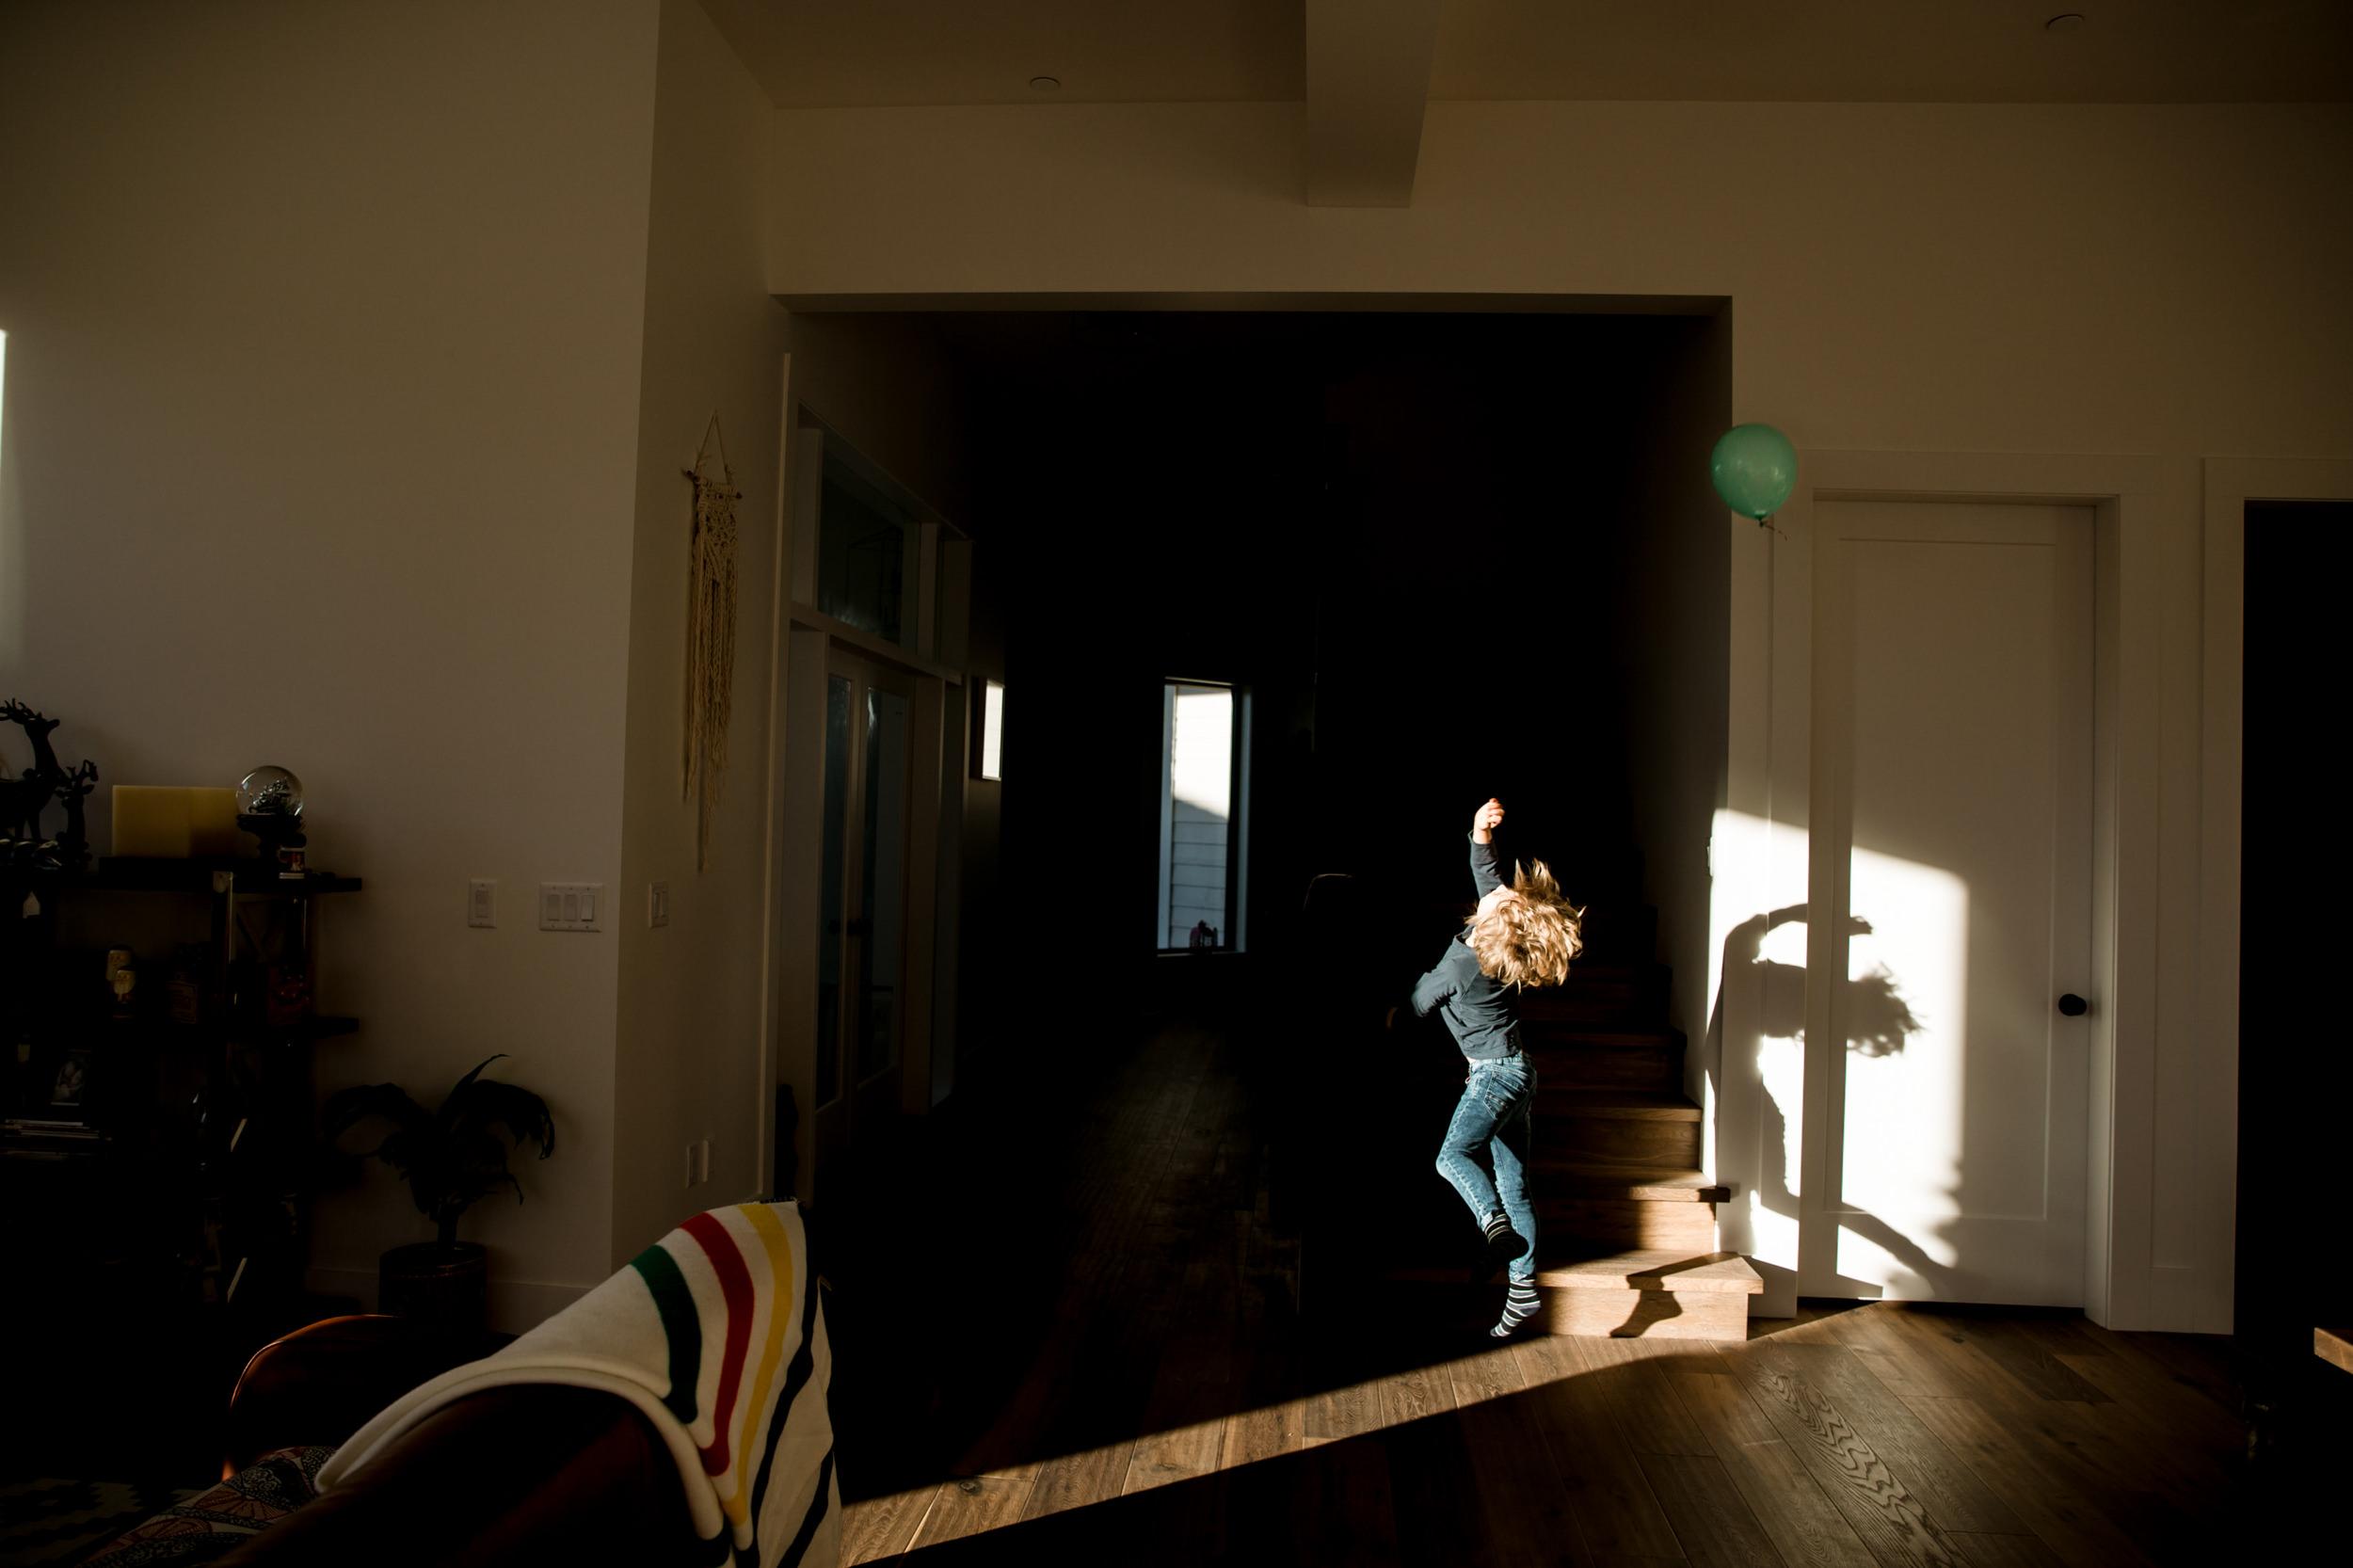 boy-hitting-balloon-in-air